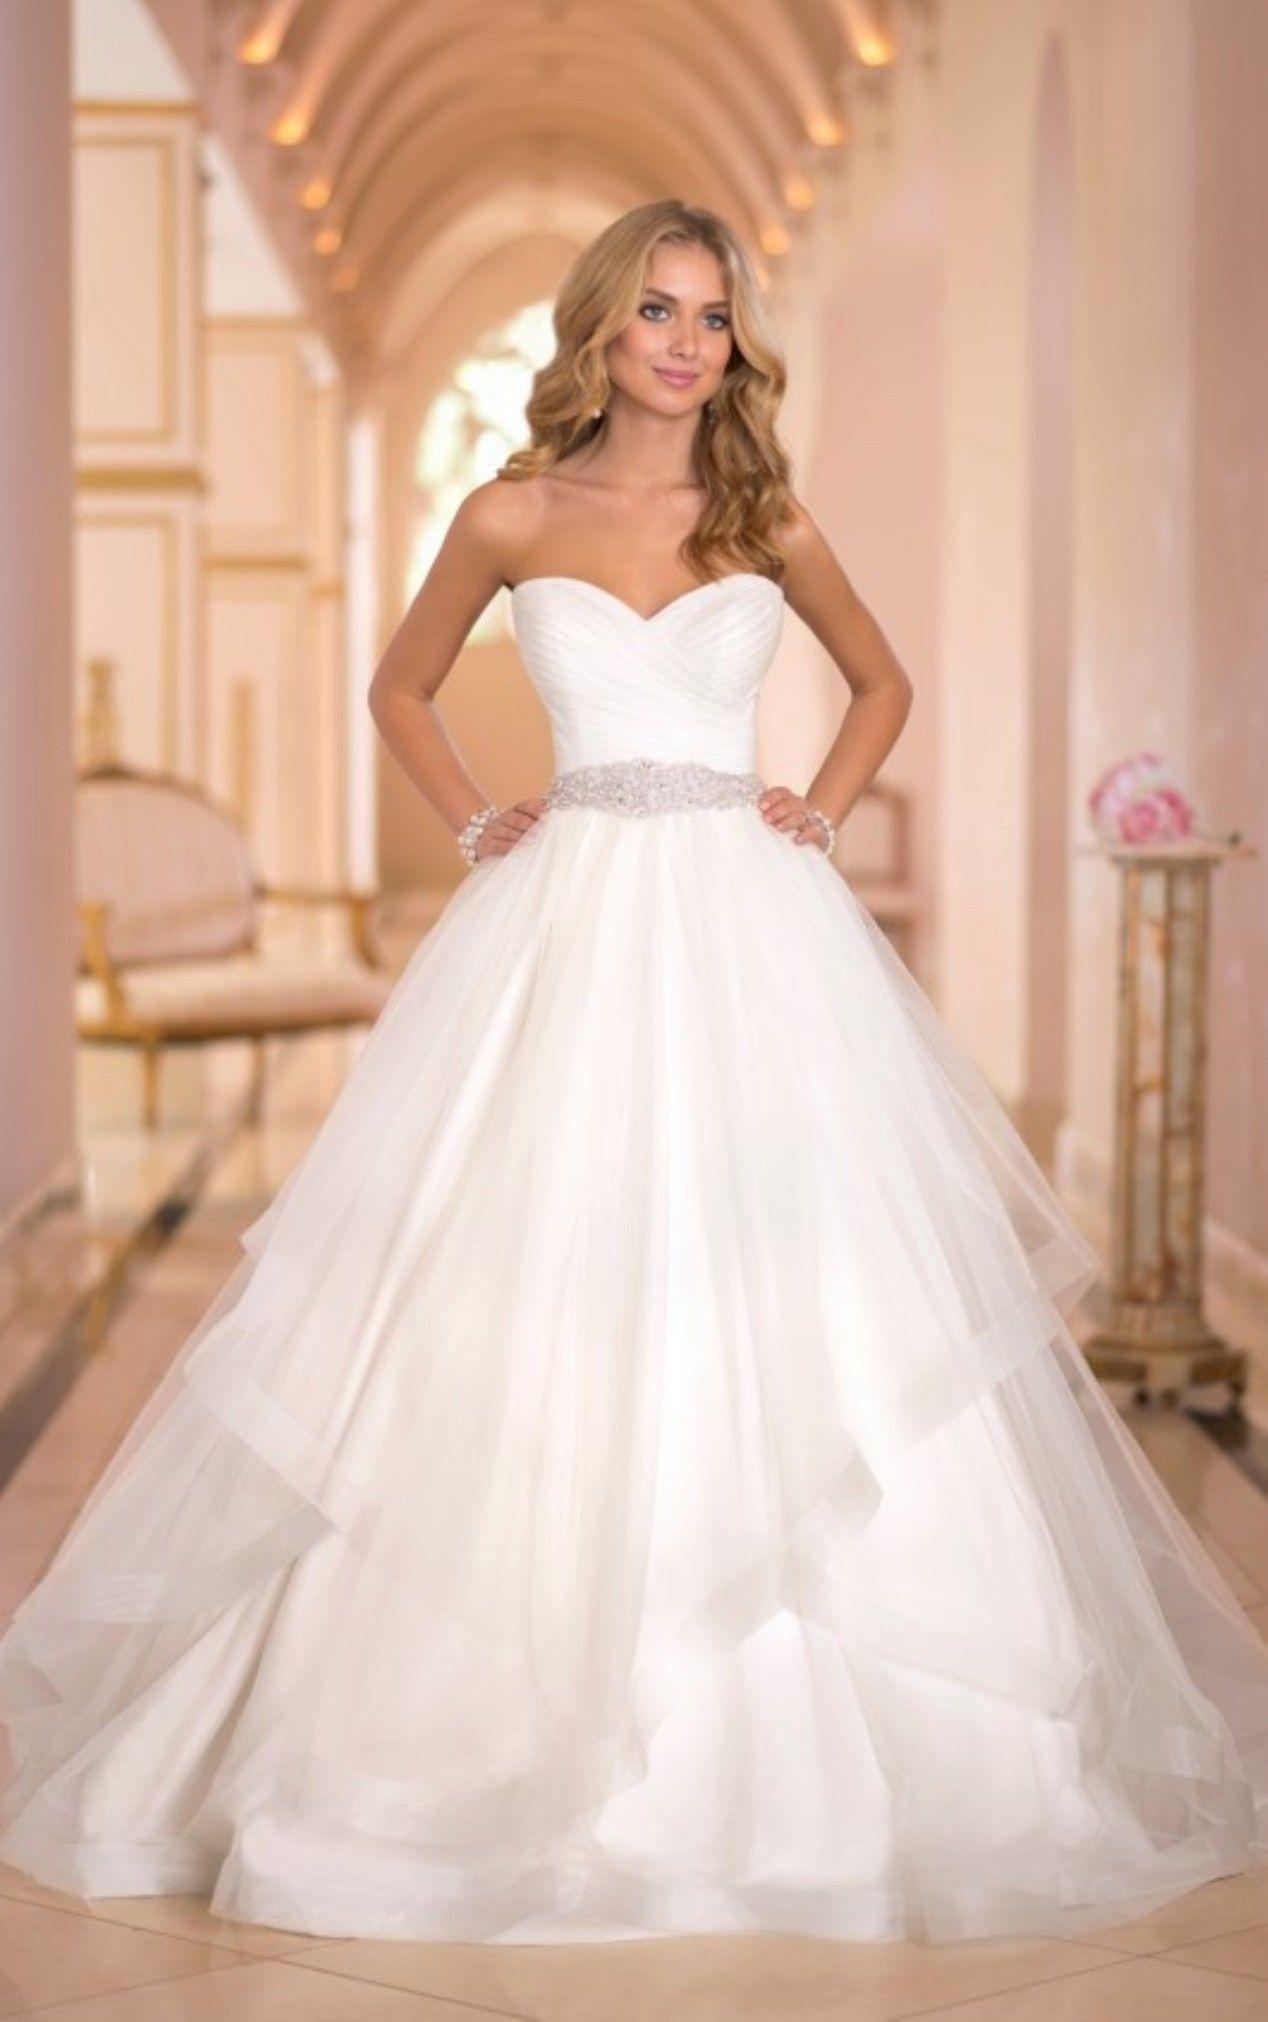 Stunning wedding dresses  Breathtaking disney princess wedding dress to fullfill your wedding